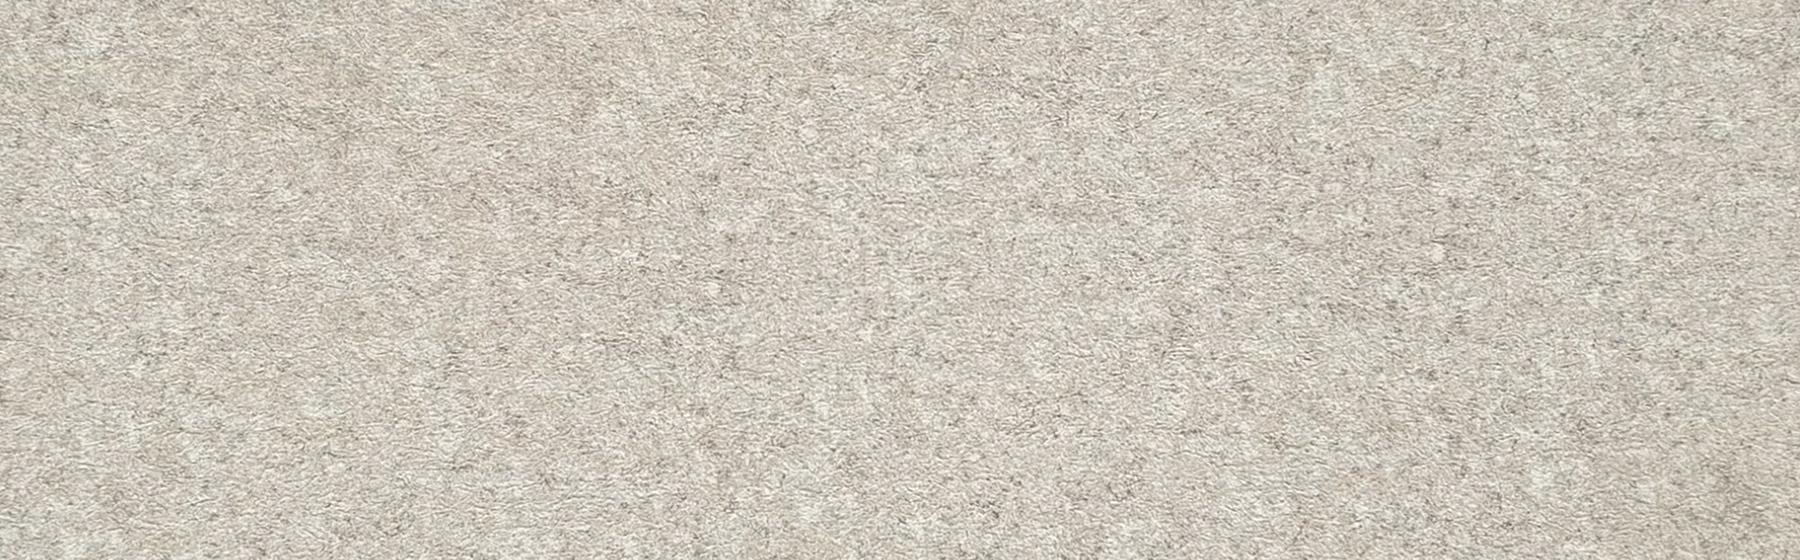 Banner image of Econodek vinyl flooring